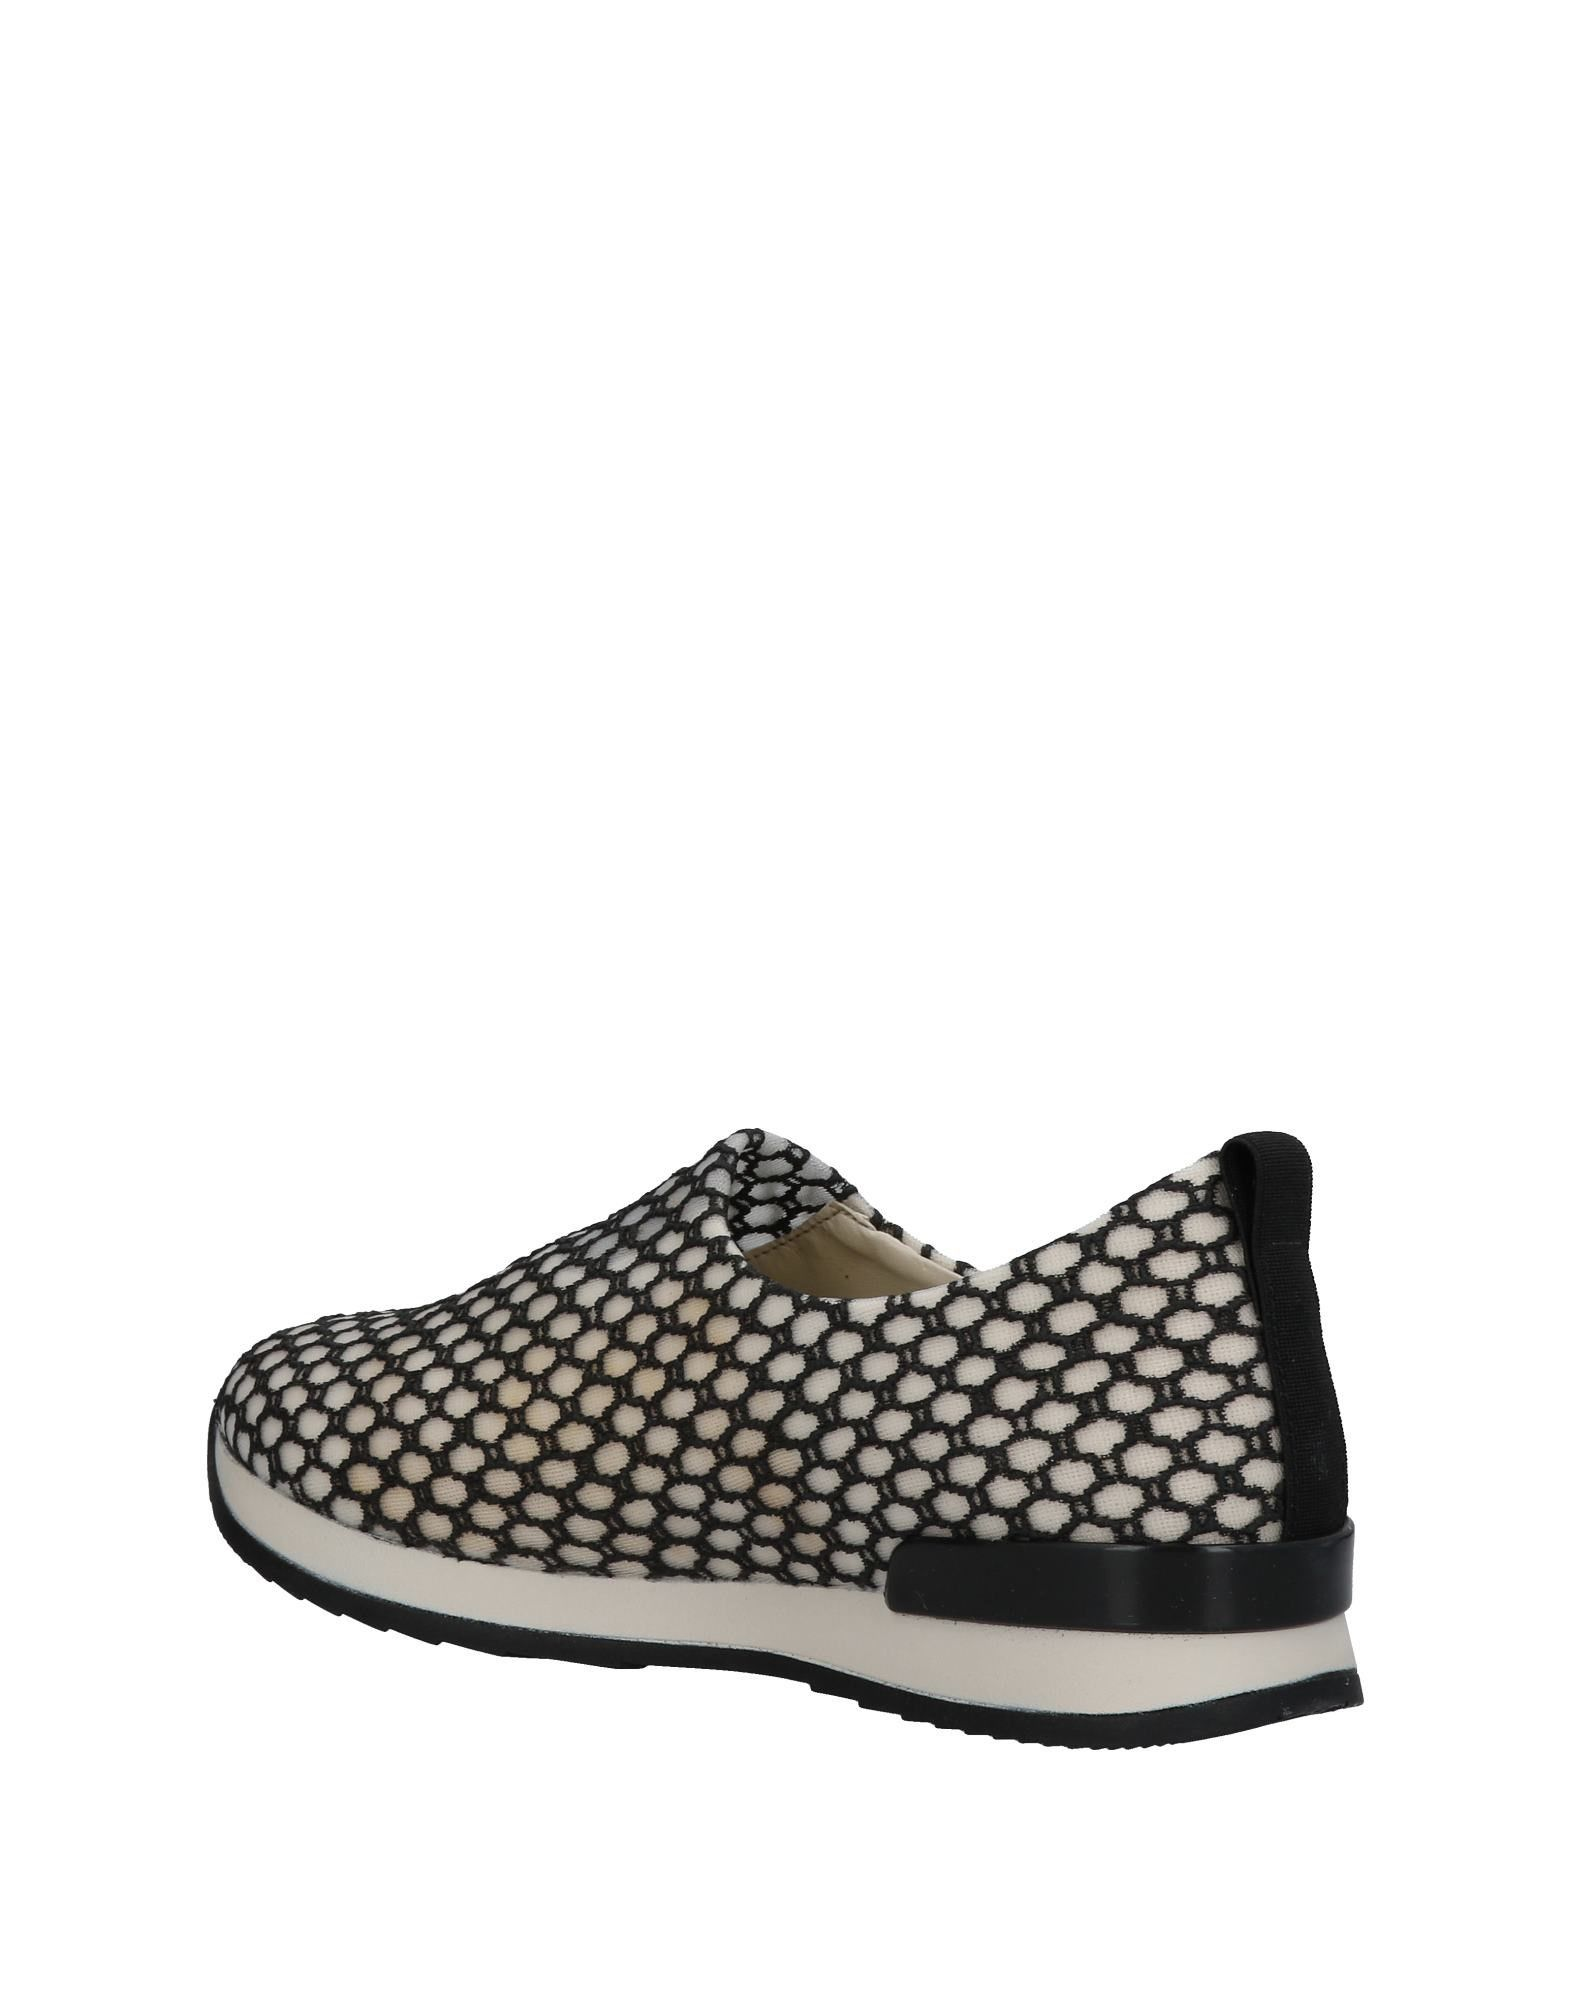 Nr Rapisardi Sneakers Damen    11419009TS Neue Schuhe 41c5c8